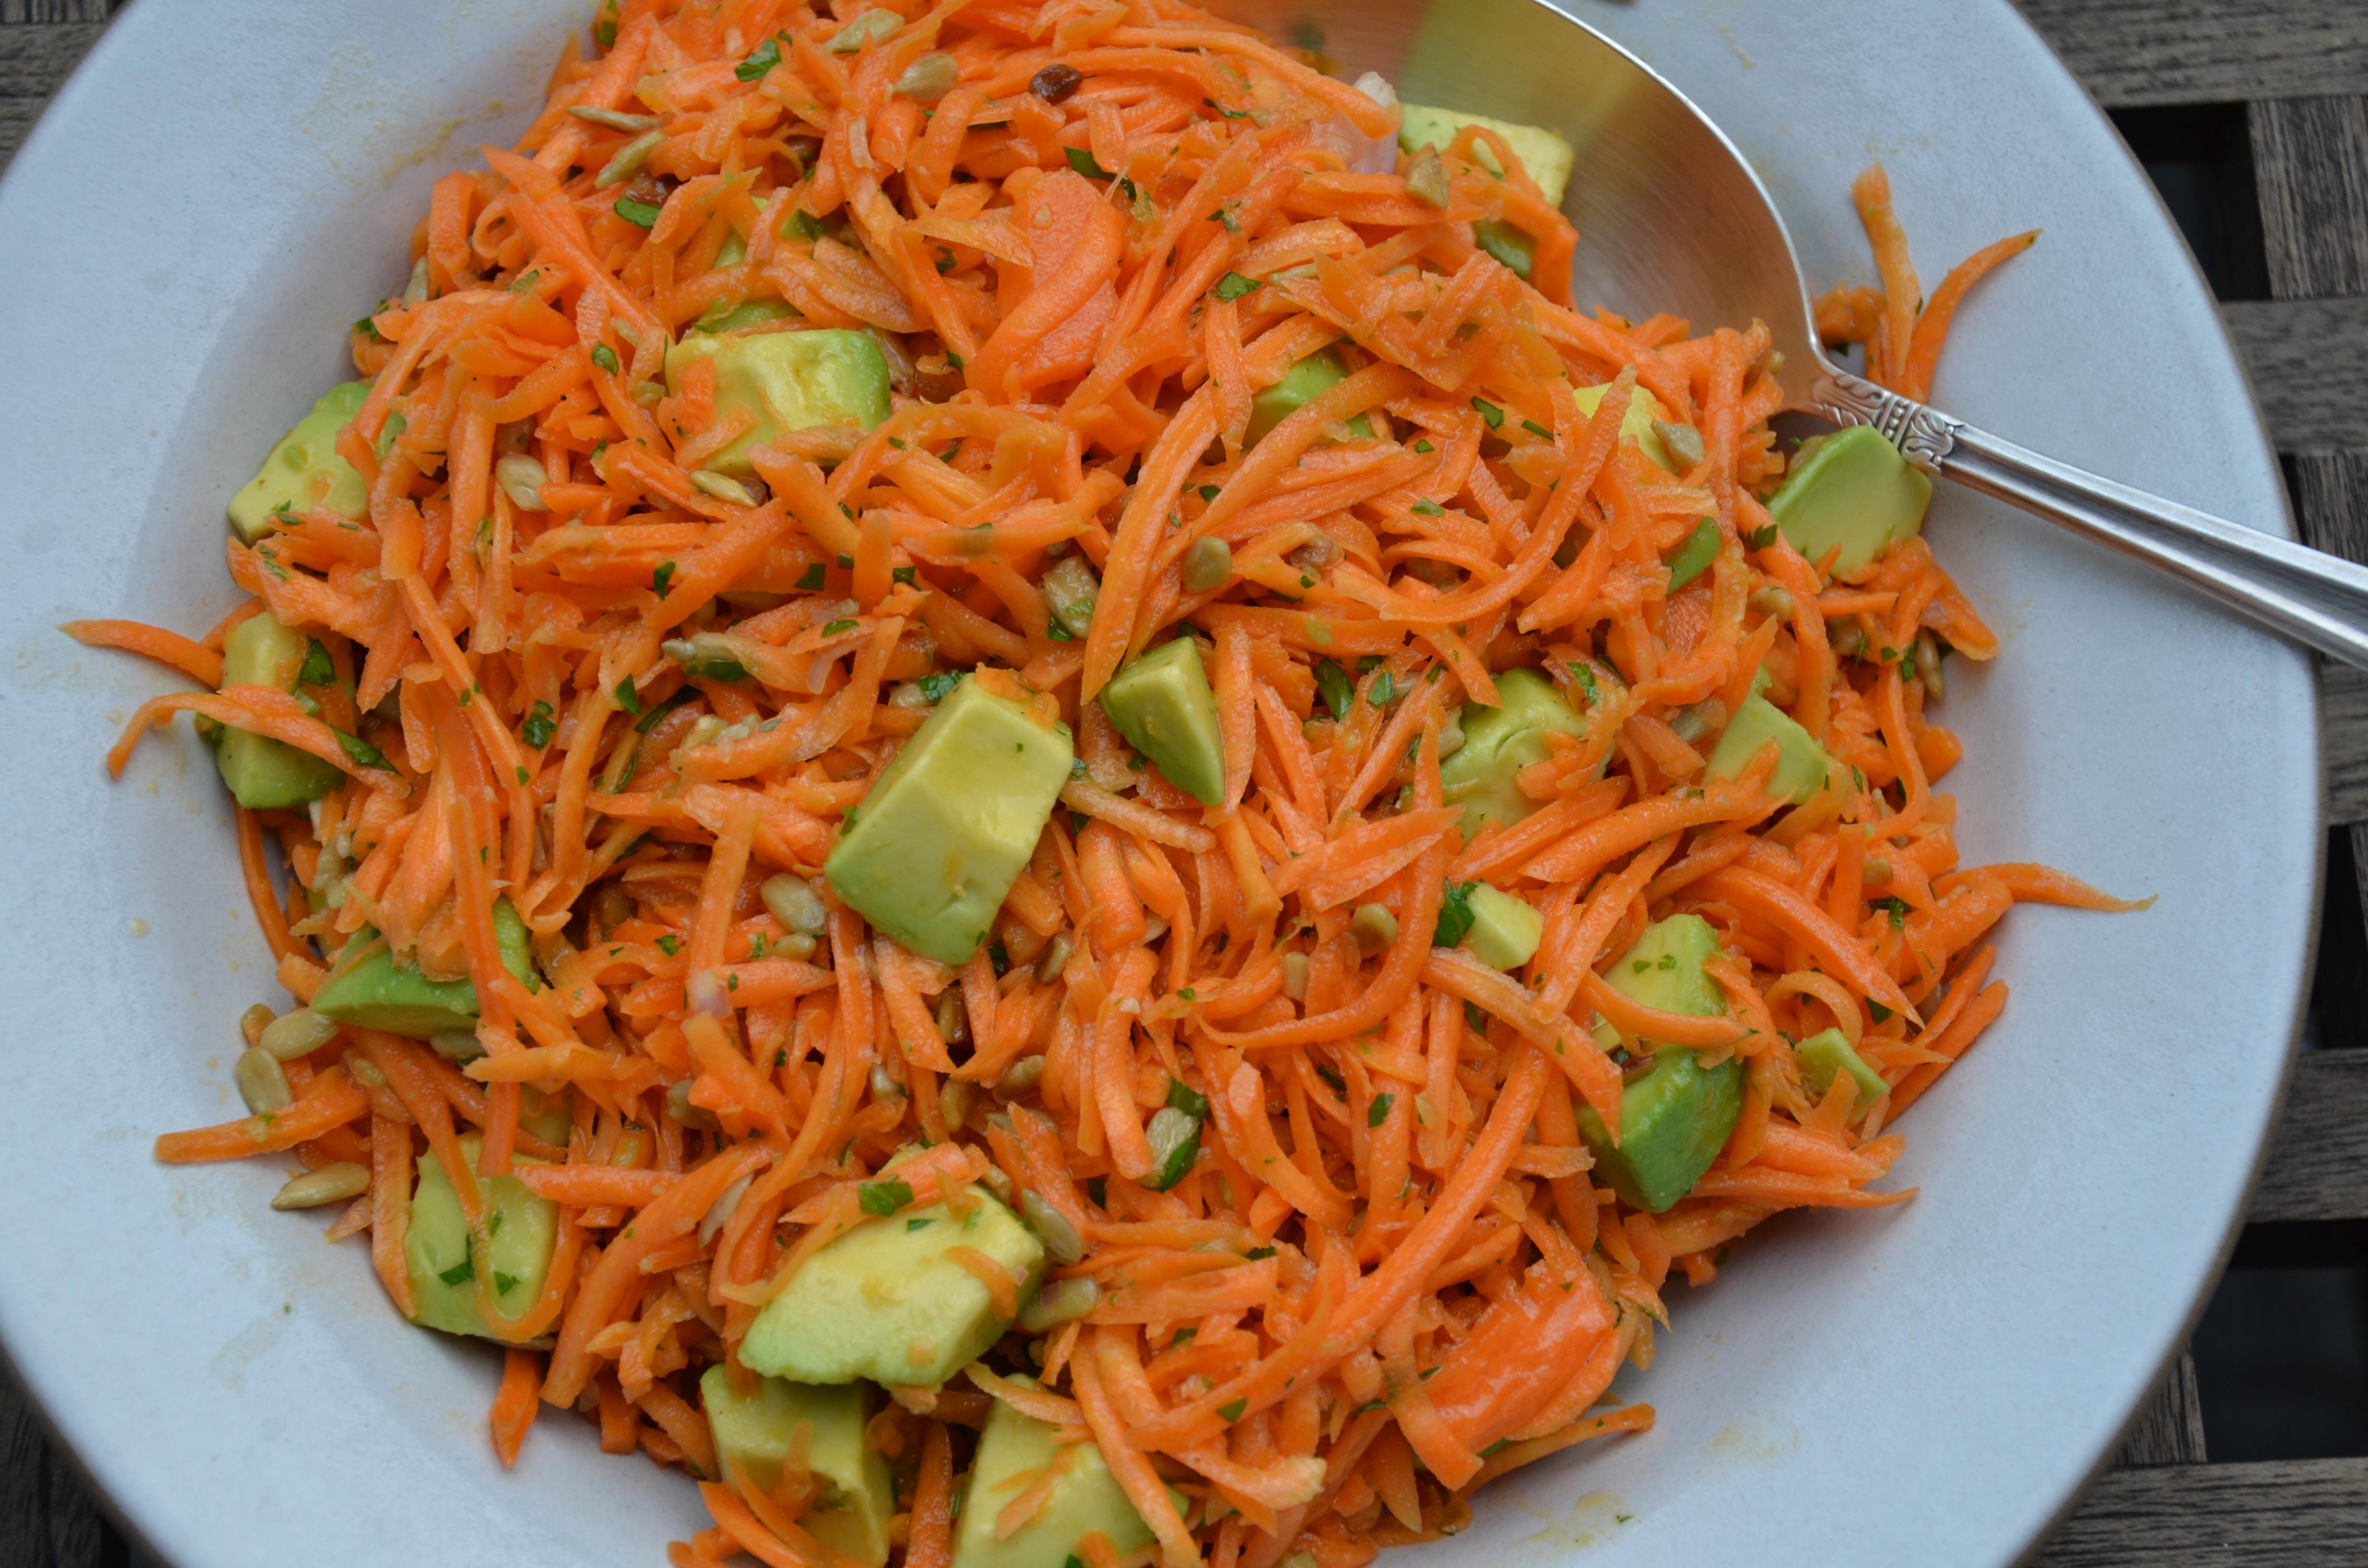 Carrot Salad Recipe  carrot salad with avocado recipe